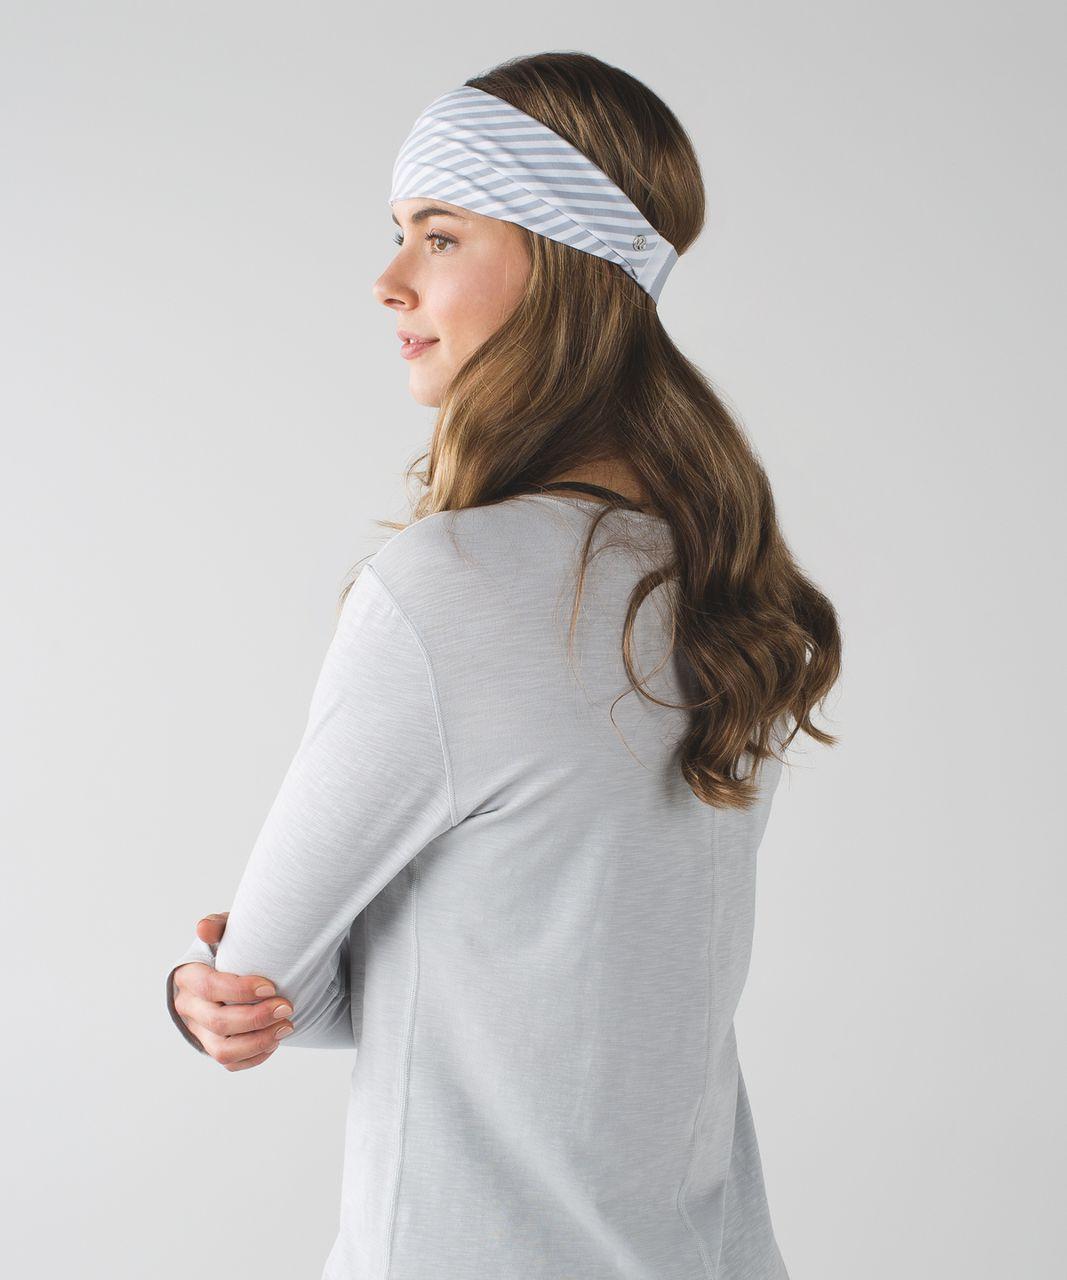 Lululemon Fringe Fighter Headband - Classic Stripe White Silver Fox / Heathered Silver Fox